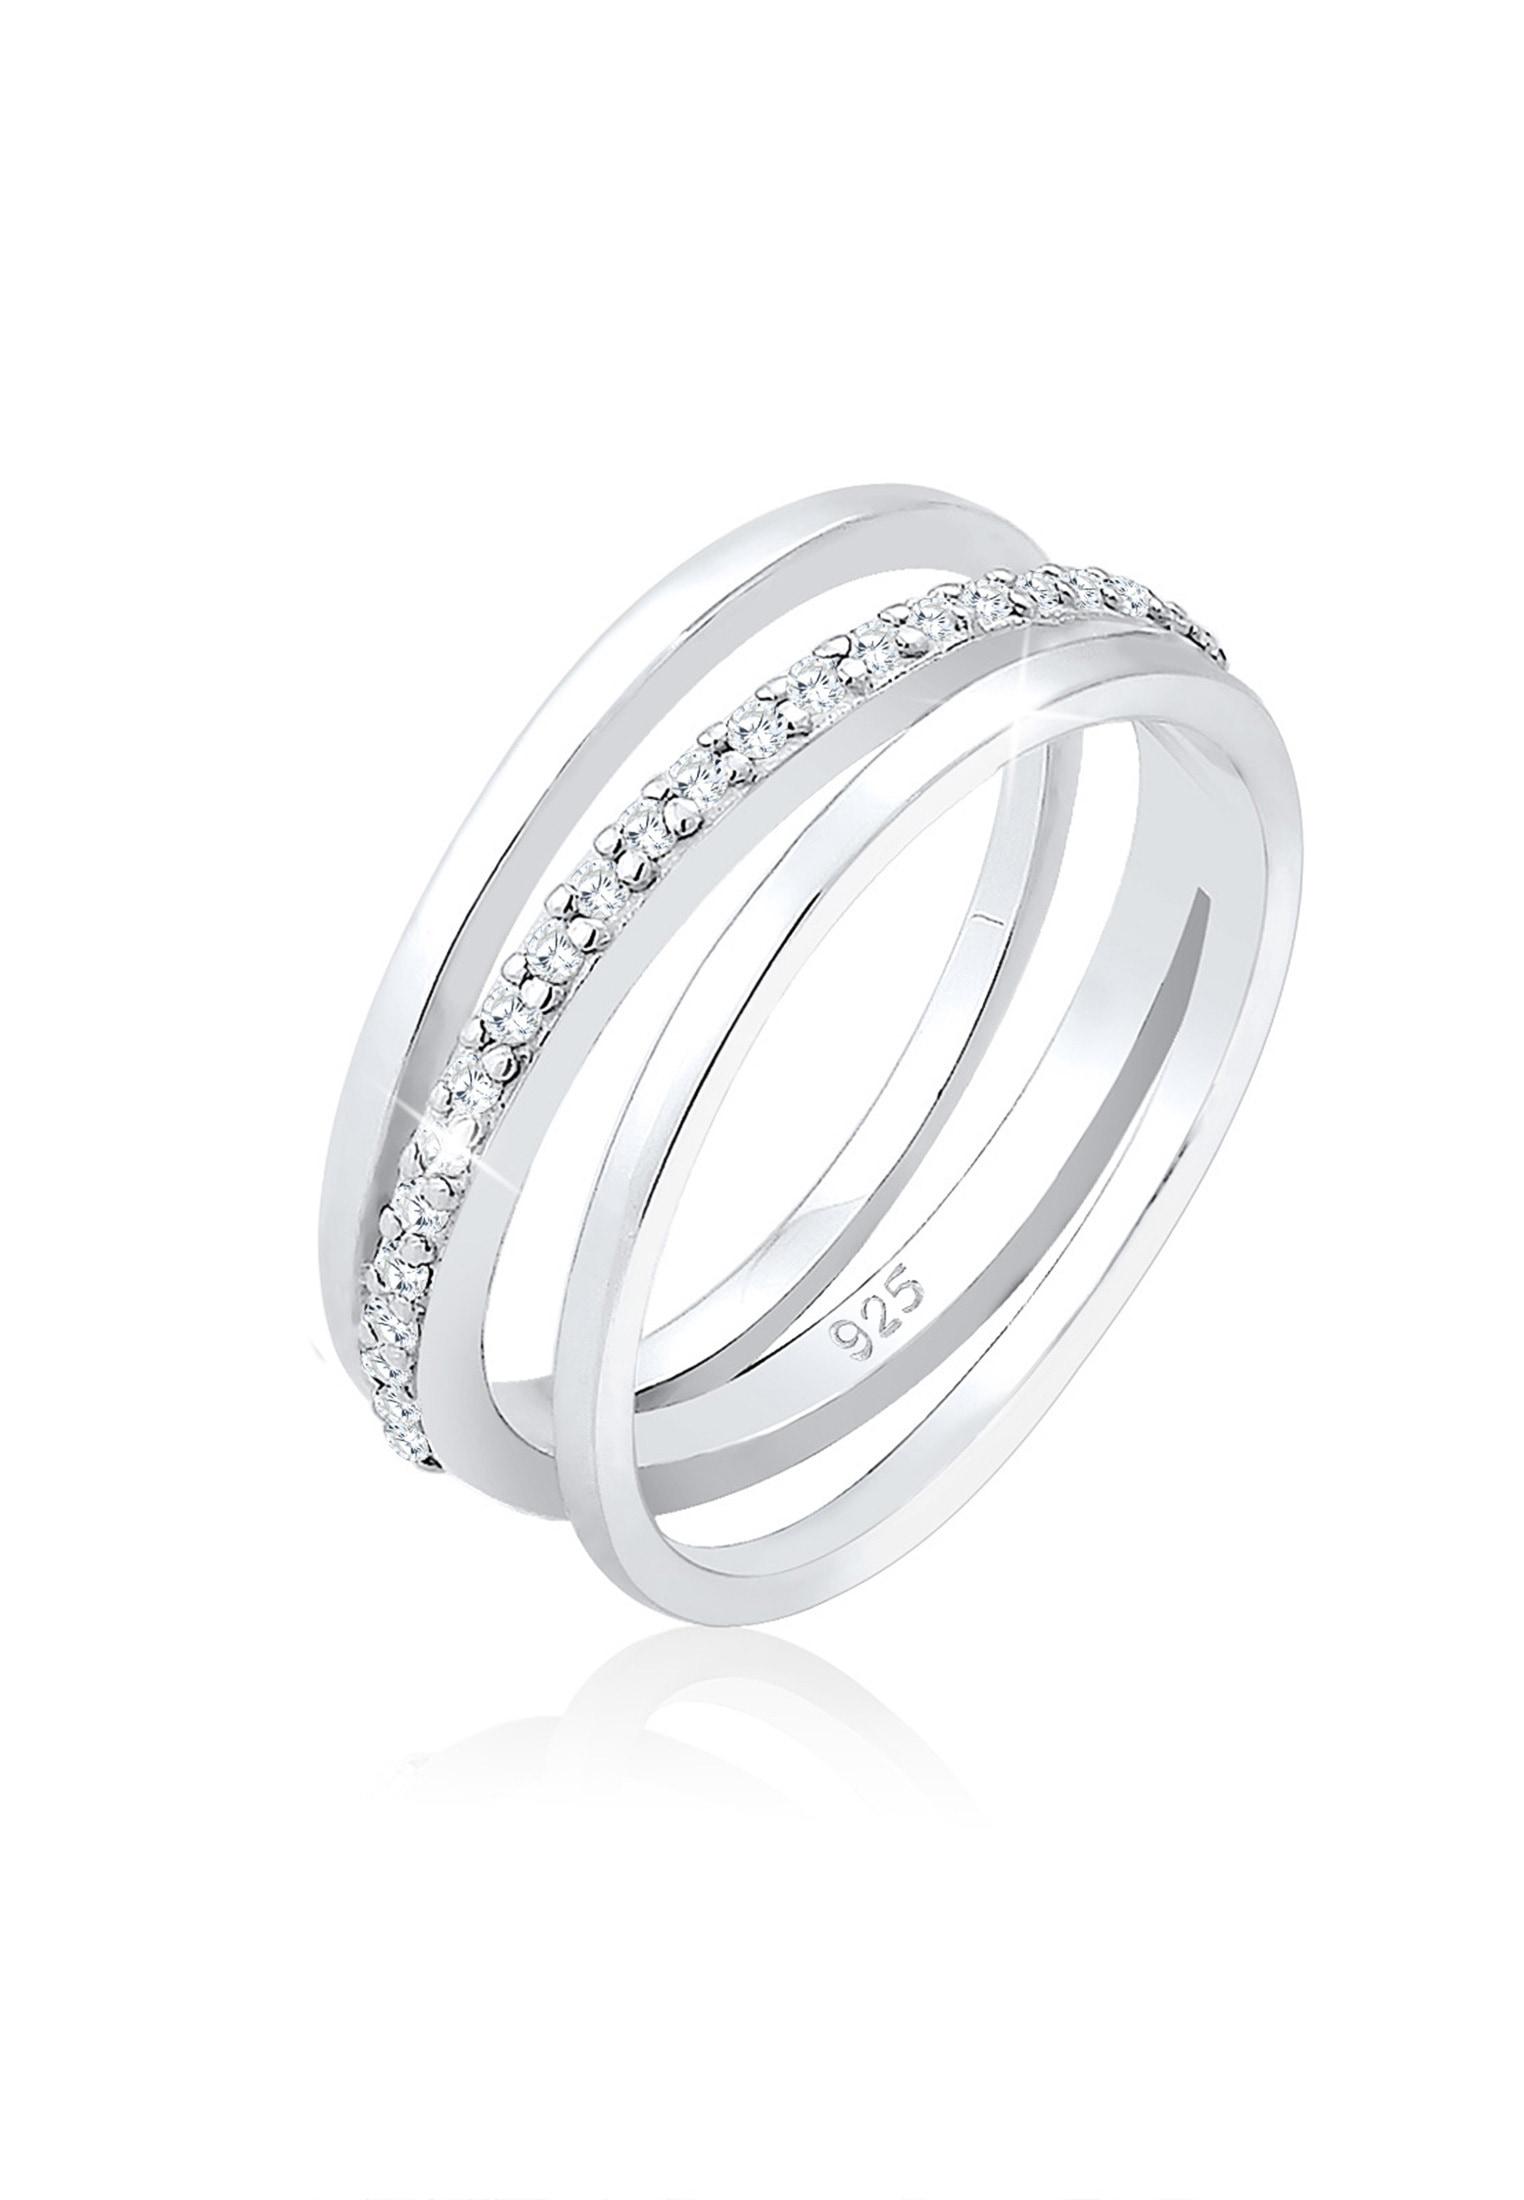 Elli Fingerring Wickelring Band Kreuz Zirkonia Modisch 925 Silber | Schmuck > Ringe > Fingerringe | Elli